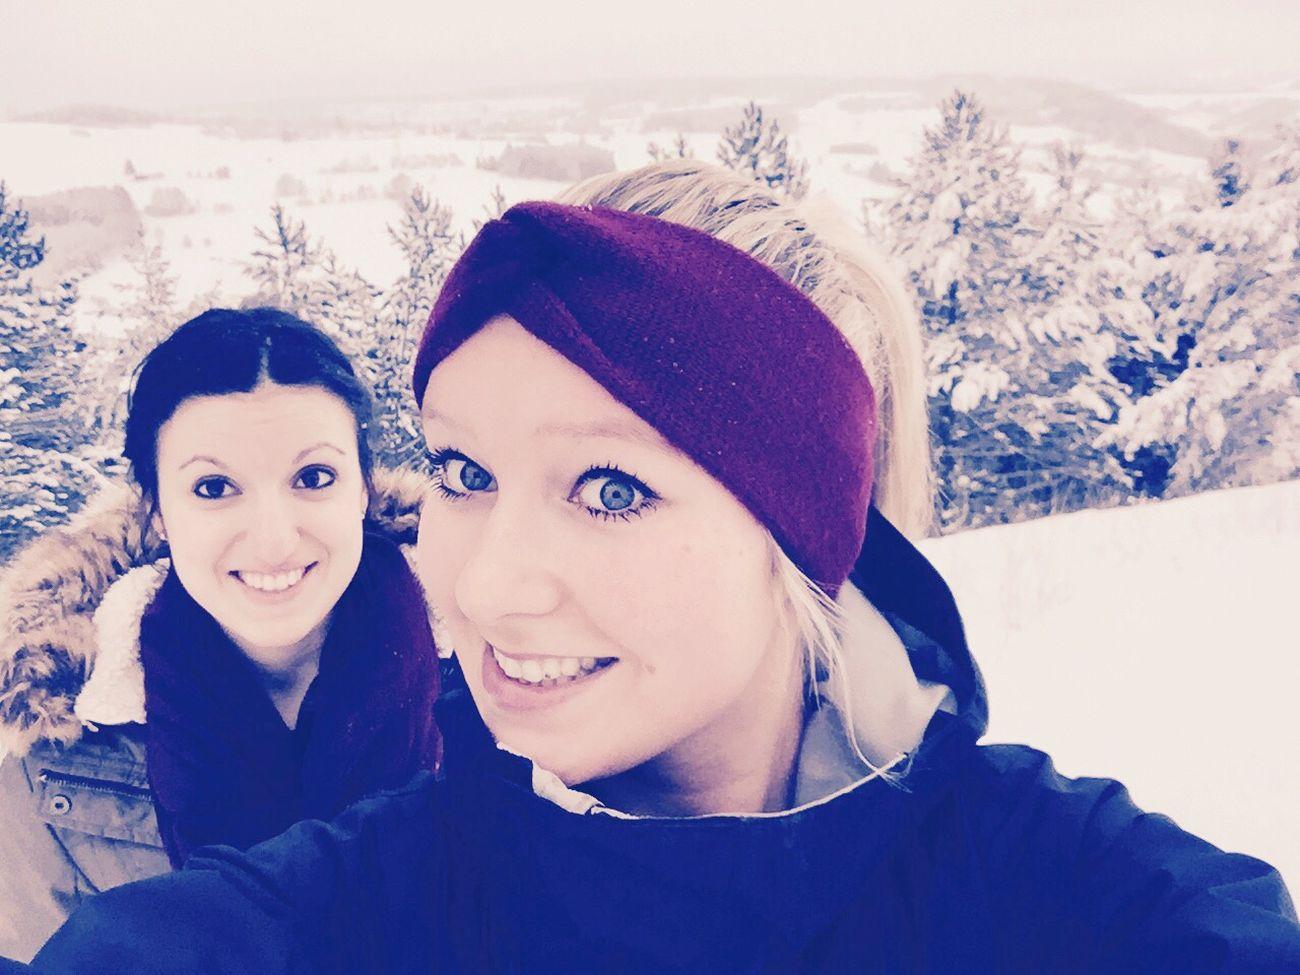 Wintertime Snow ❄ Friends ❤ Foreva ?❤️❄️⛄️✌️